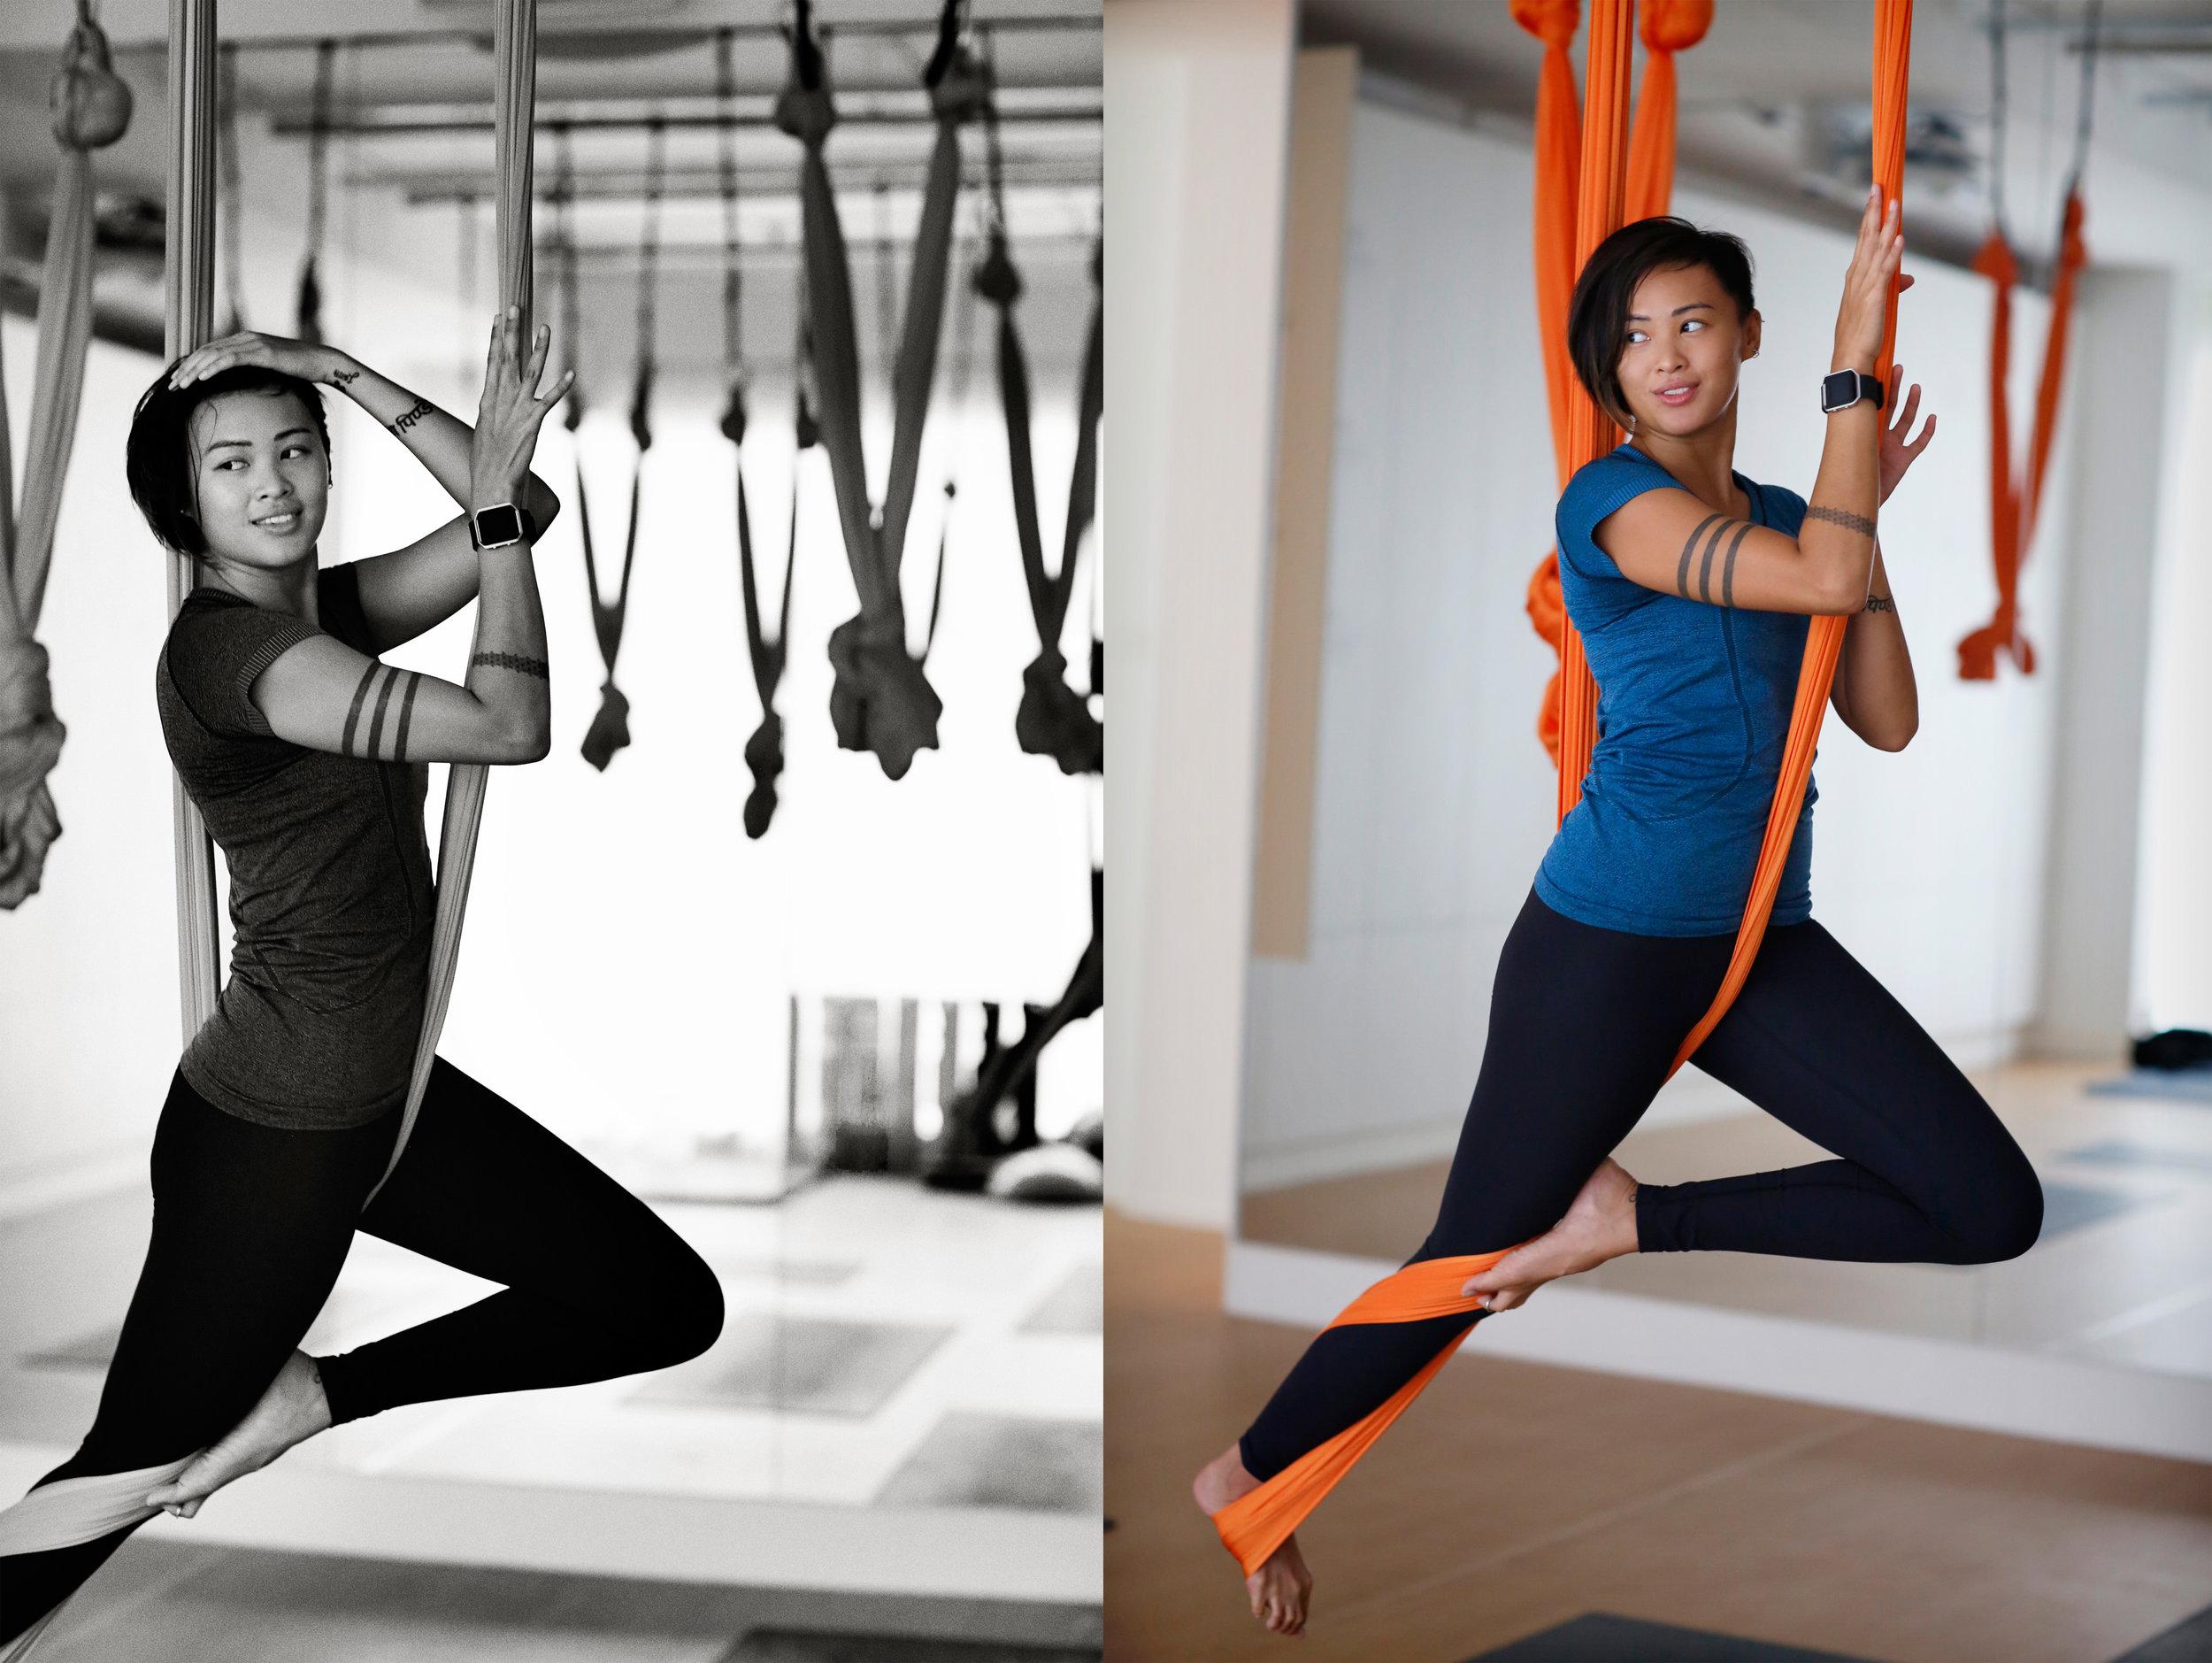 Trainer Pilates And Yoga Kuala Lumpur Malaysia Wow Woman